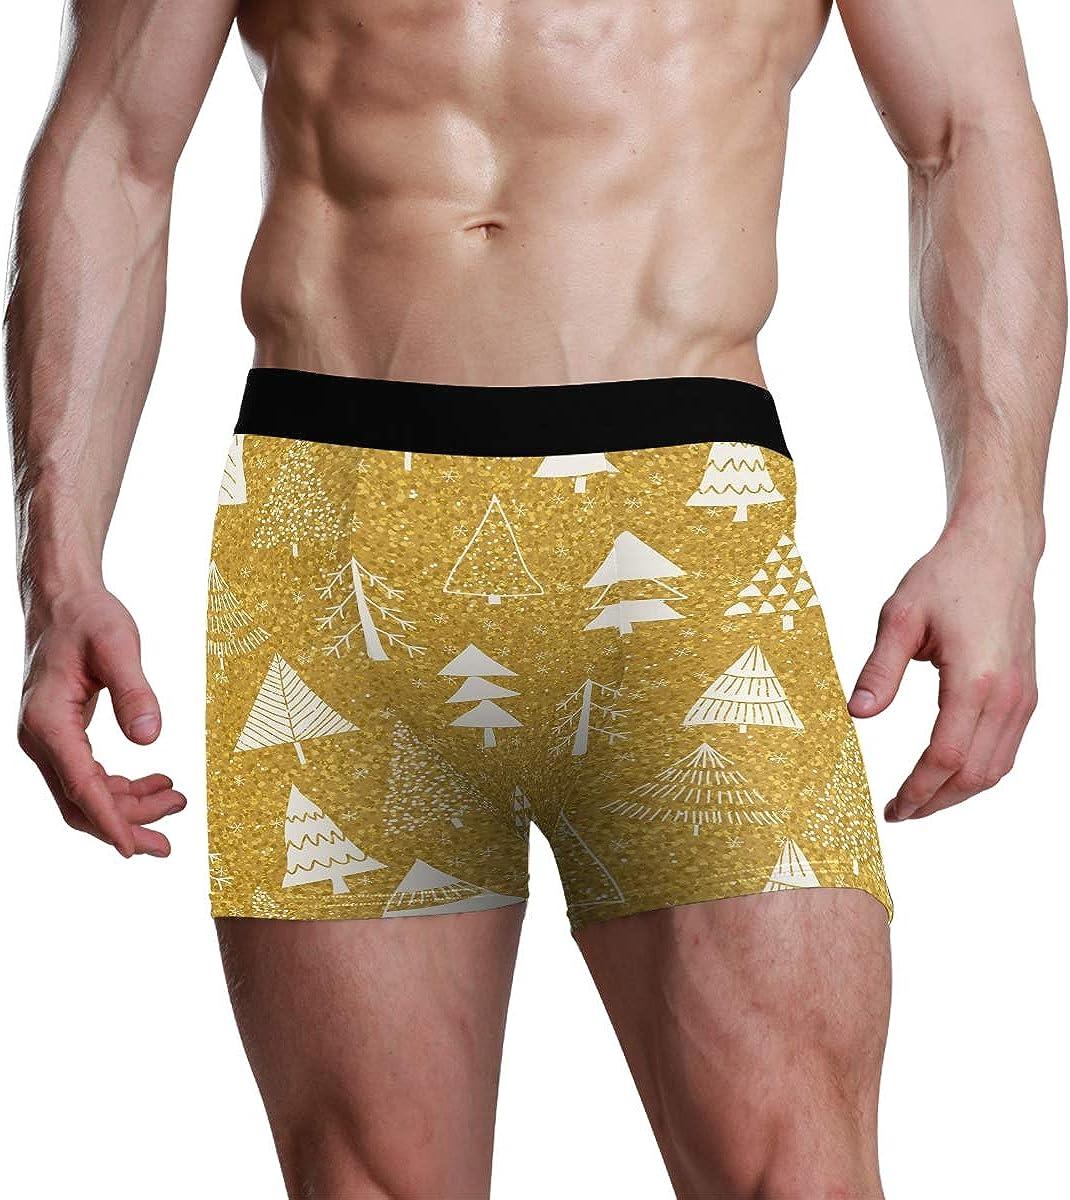 Men's Boxer Briefs Happy New Year Seamless Pattern Bikini Underwear Stretch Trunks Boys Underpants